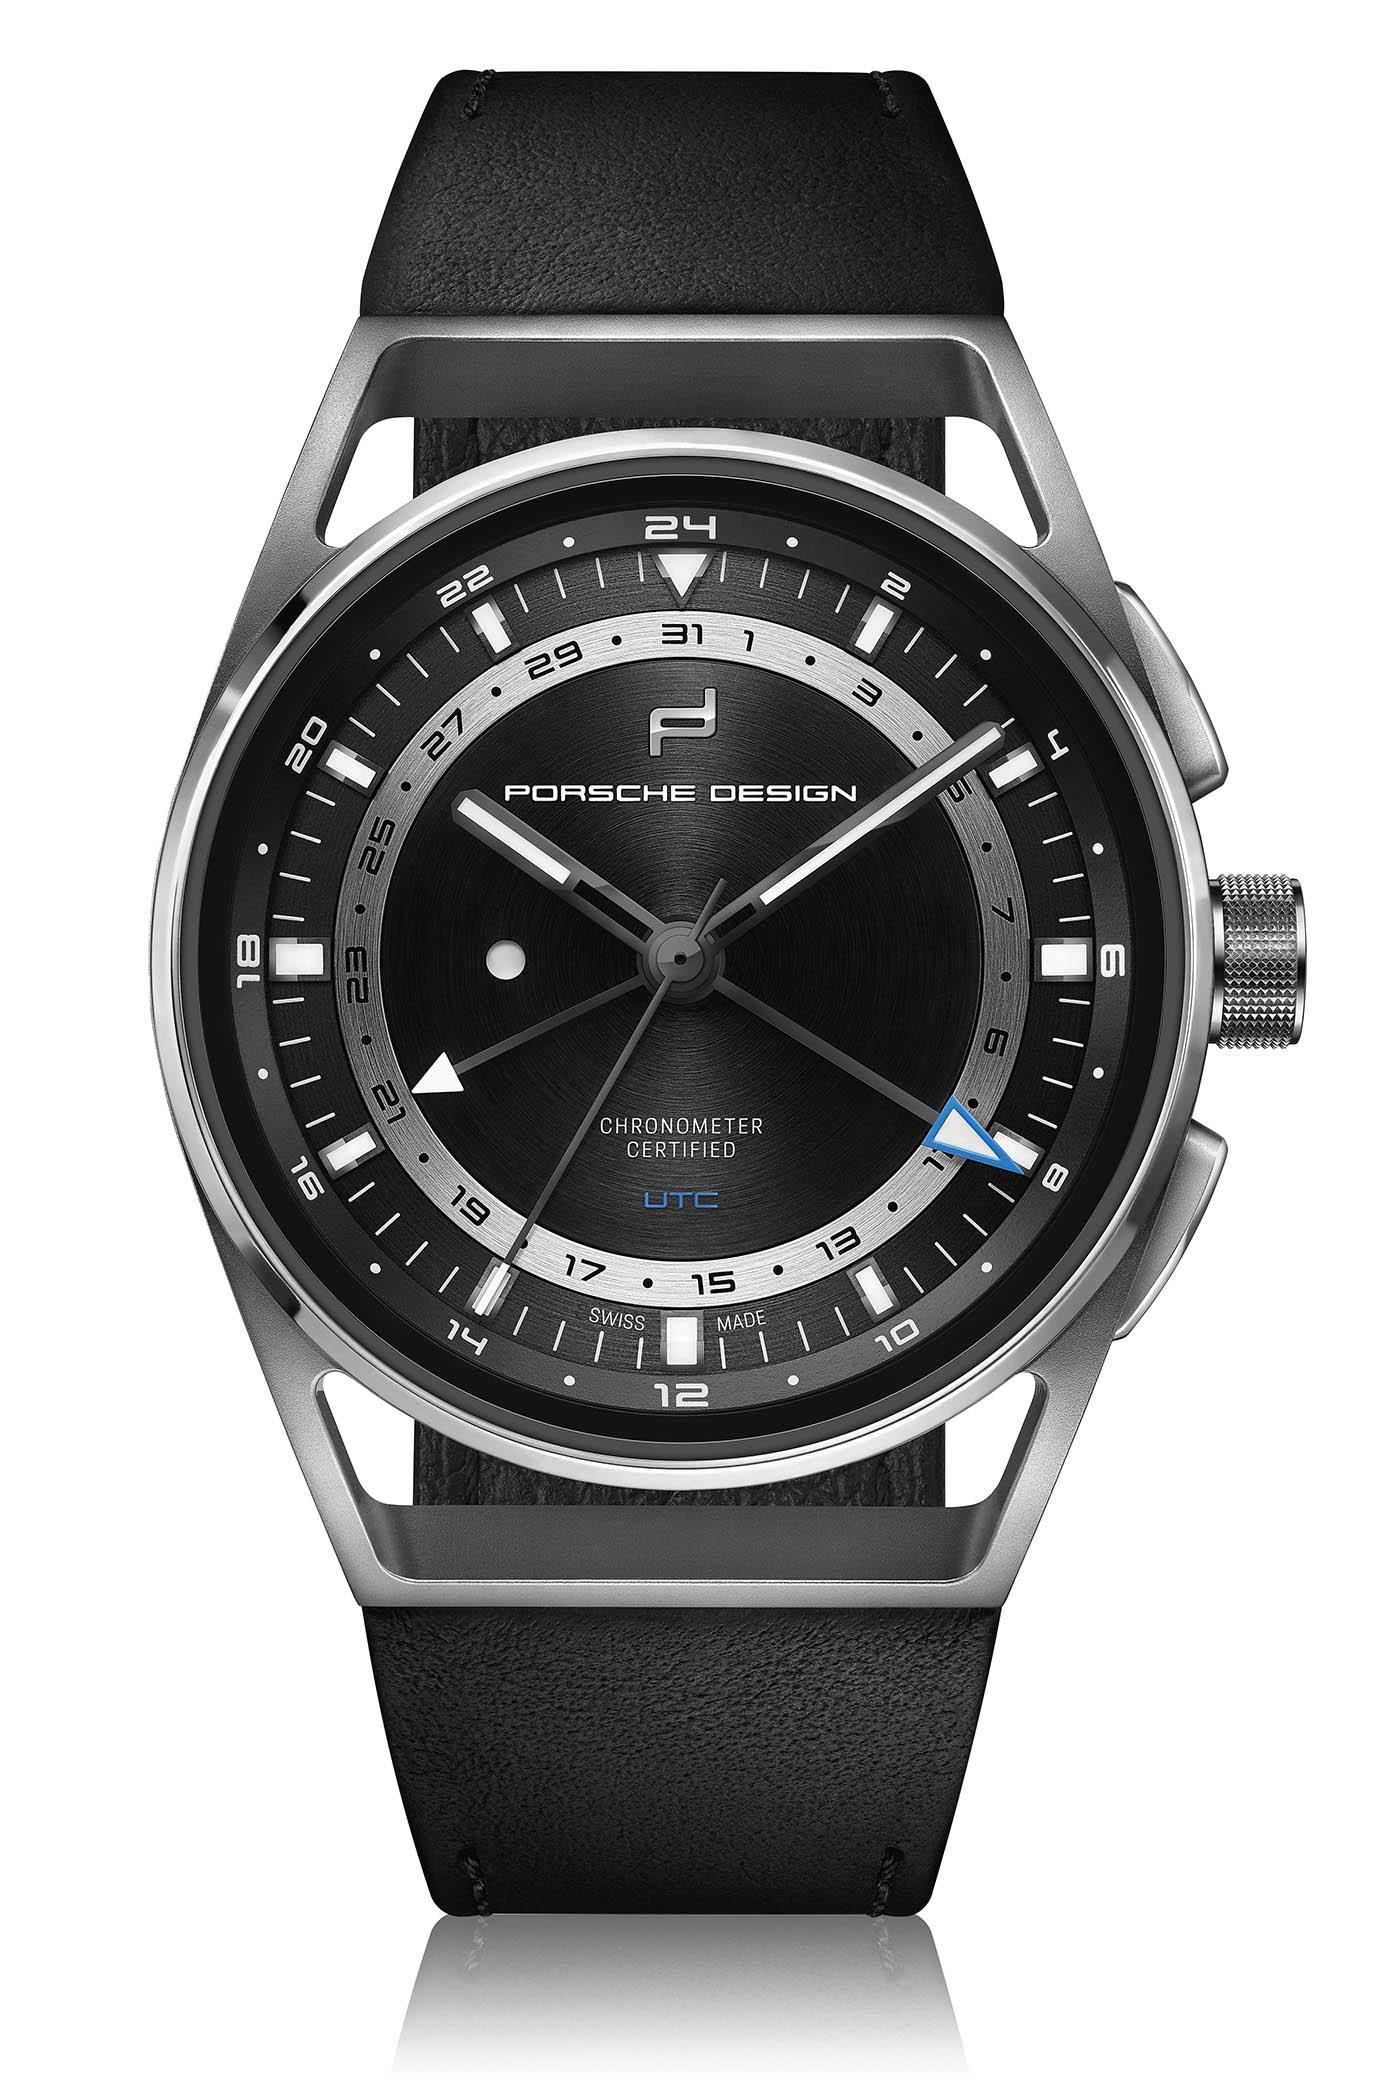 Porsche Design 1919 Globetimer UTC - Baselworld 2019 - 2